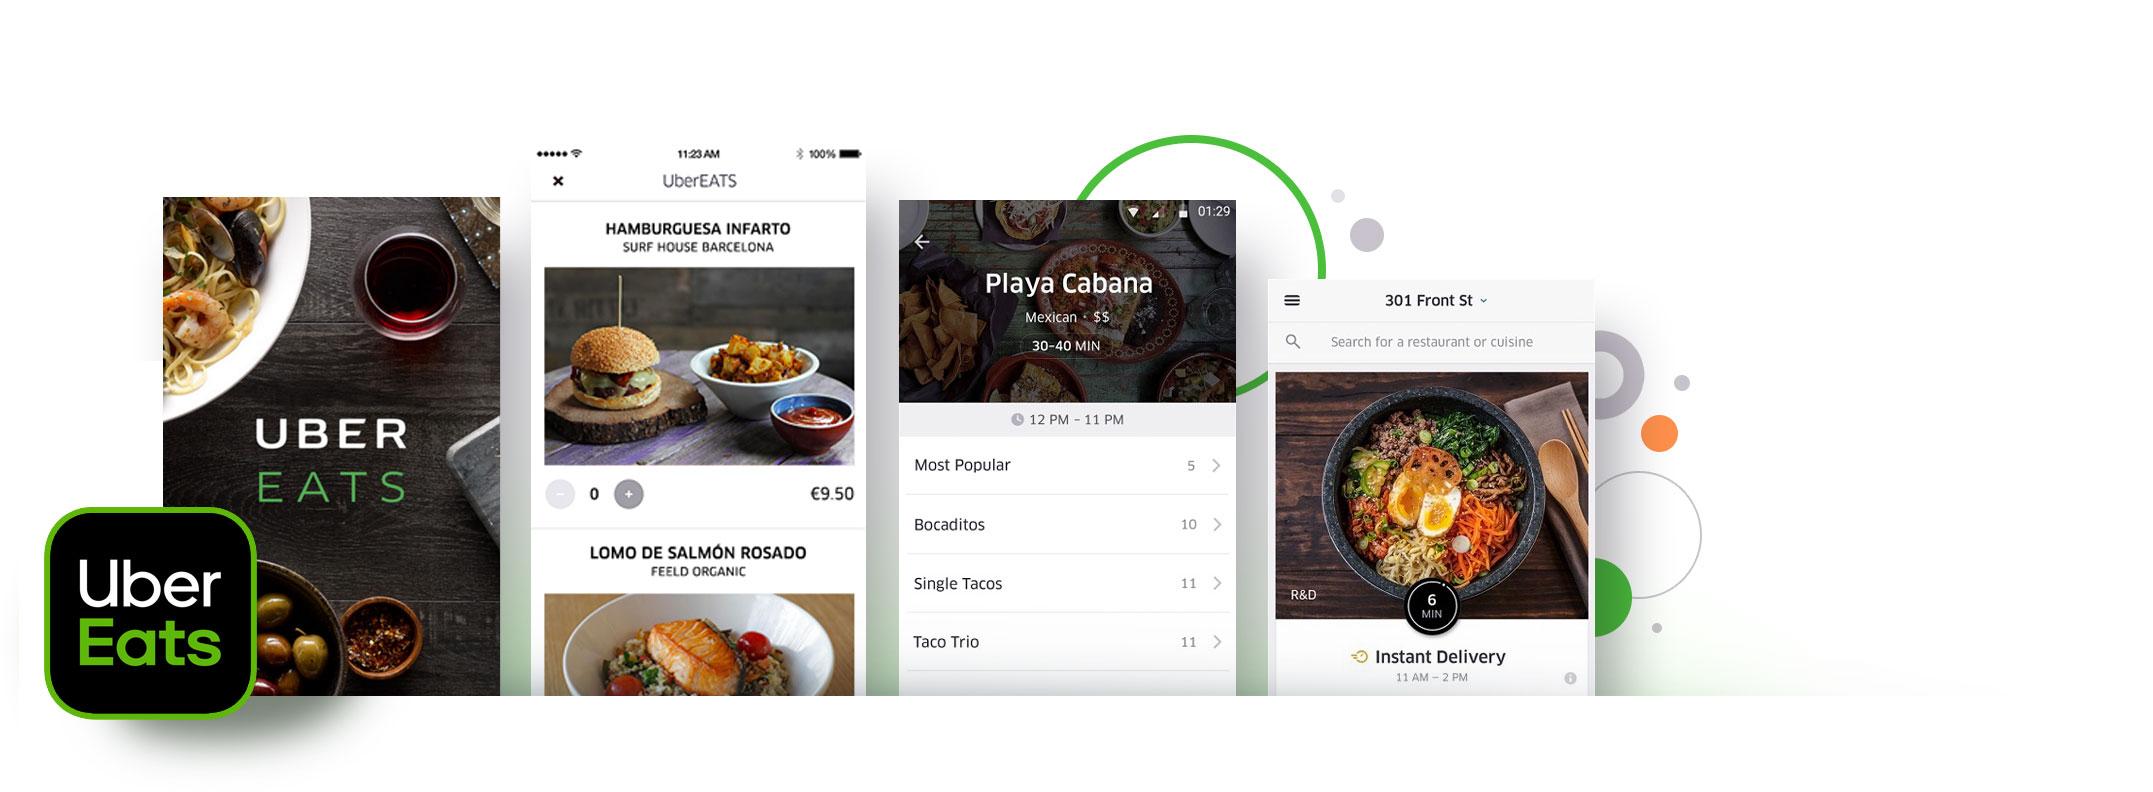 React Native app examples - Uber Eats App